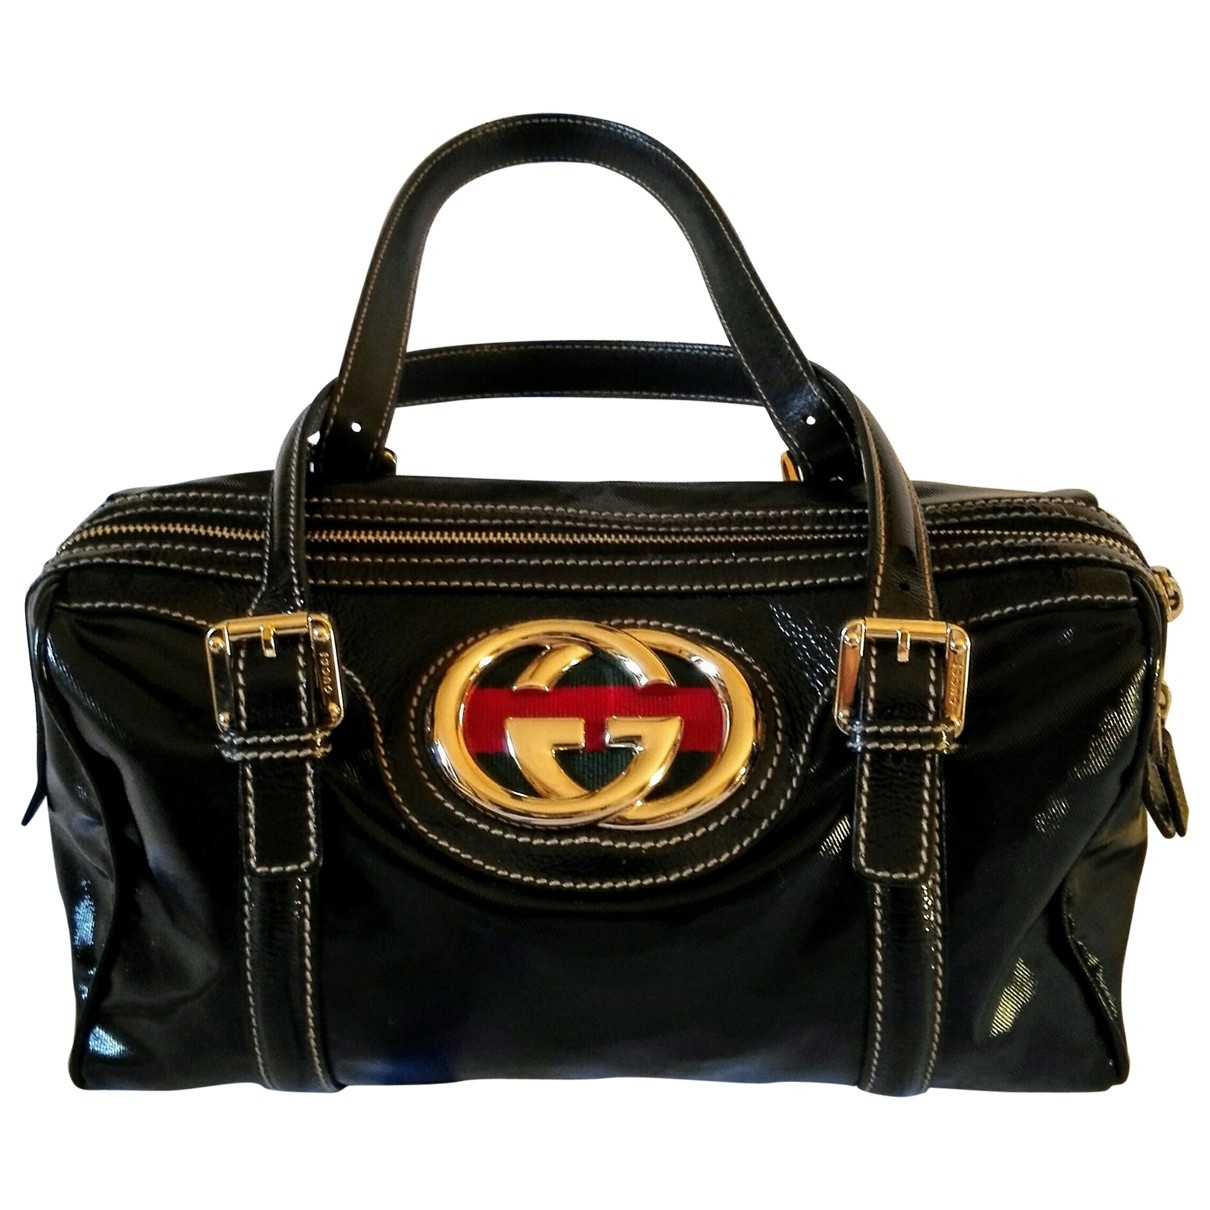 Gucci \N Black Patent leather handbag for Women \N